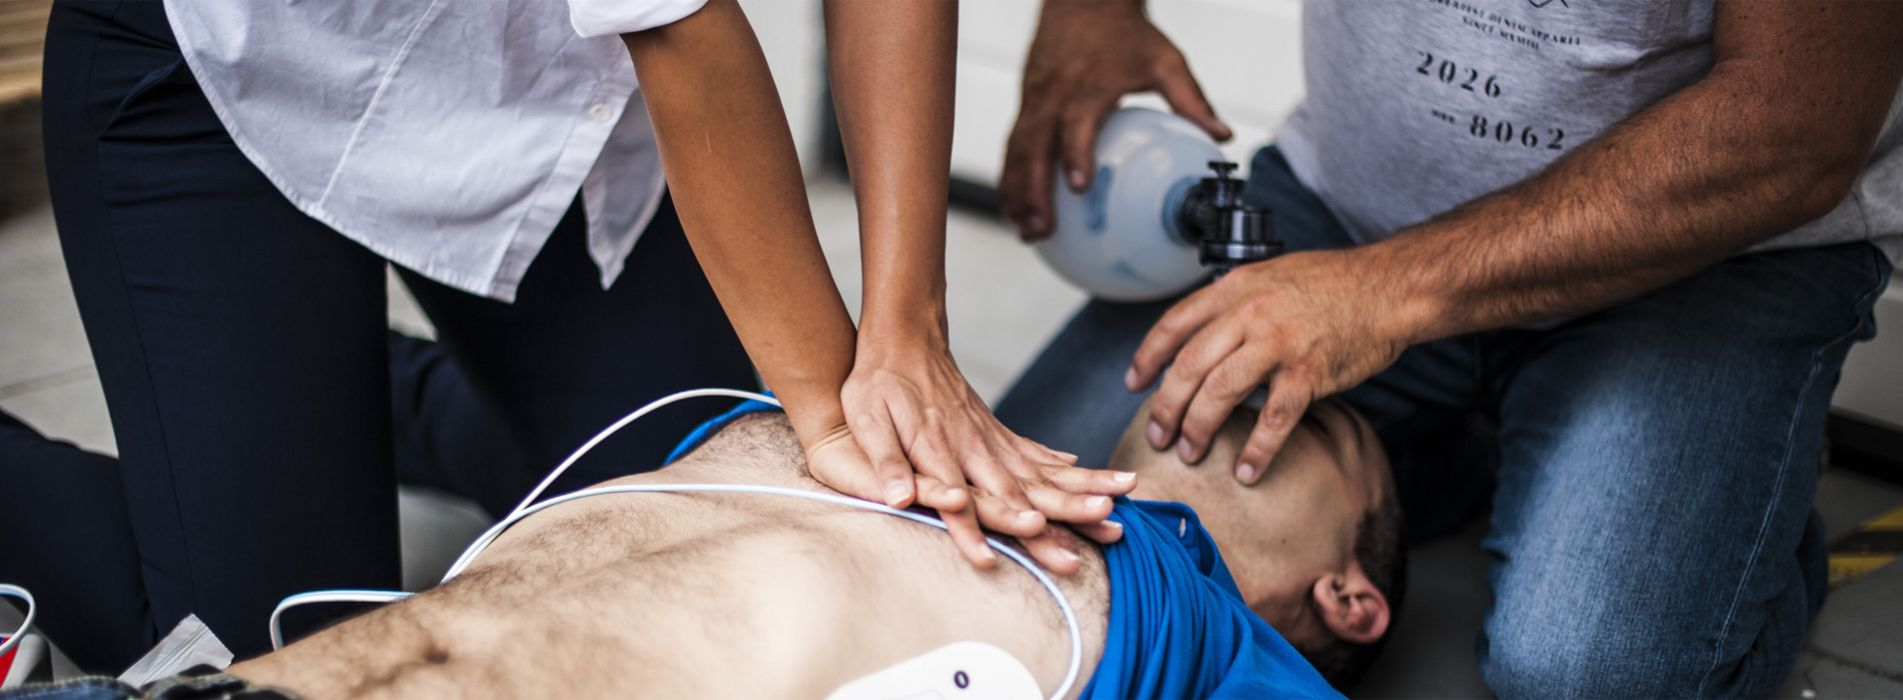 burton first aid training